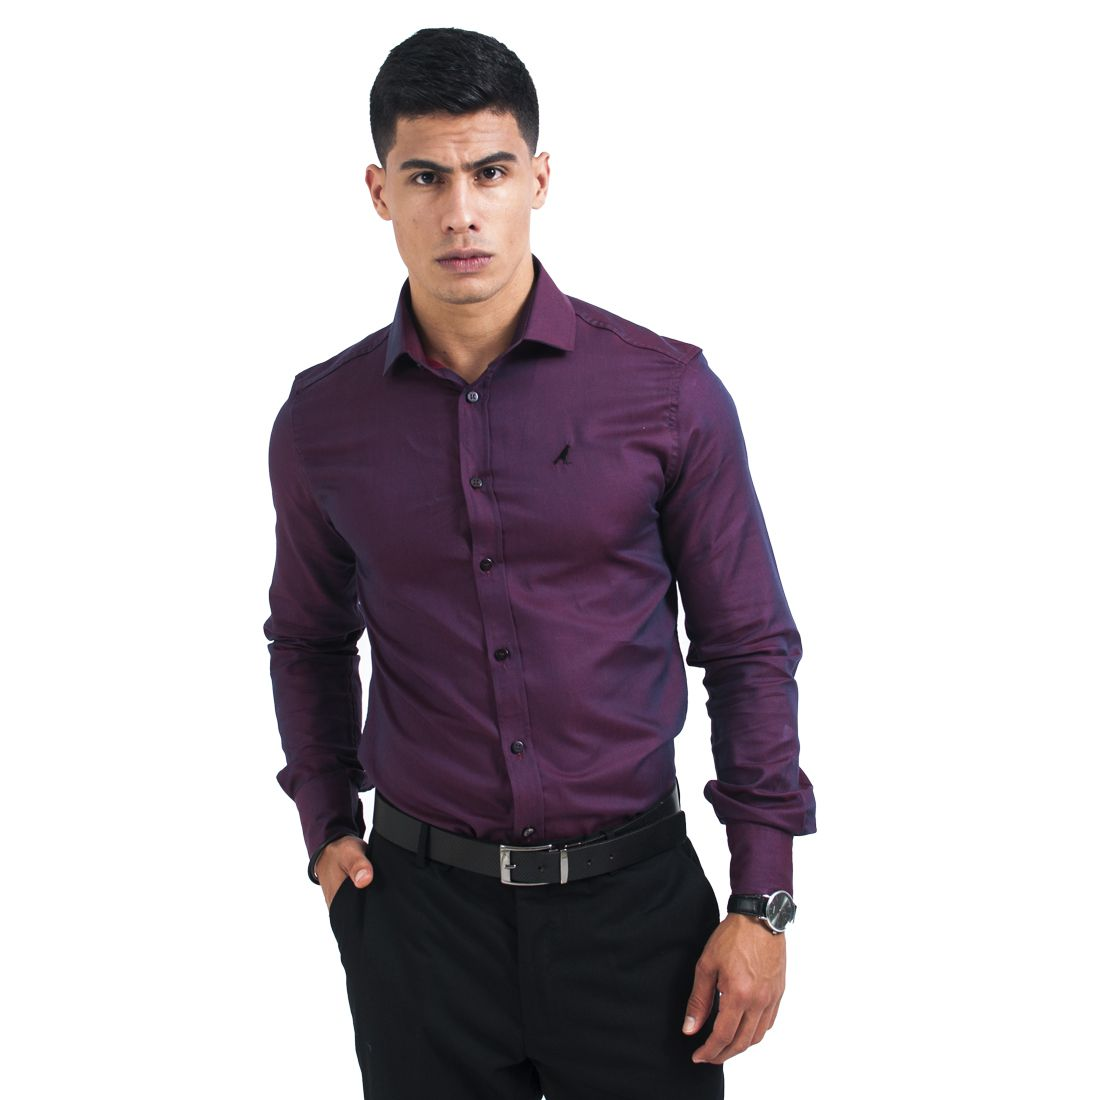 100403 - Camisa Masculina Social Slim Vinho - LEVOK